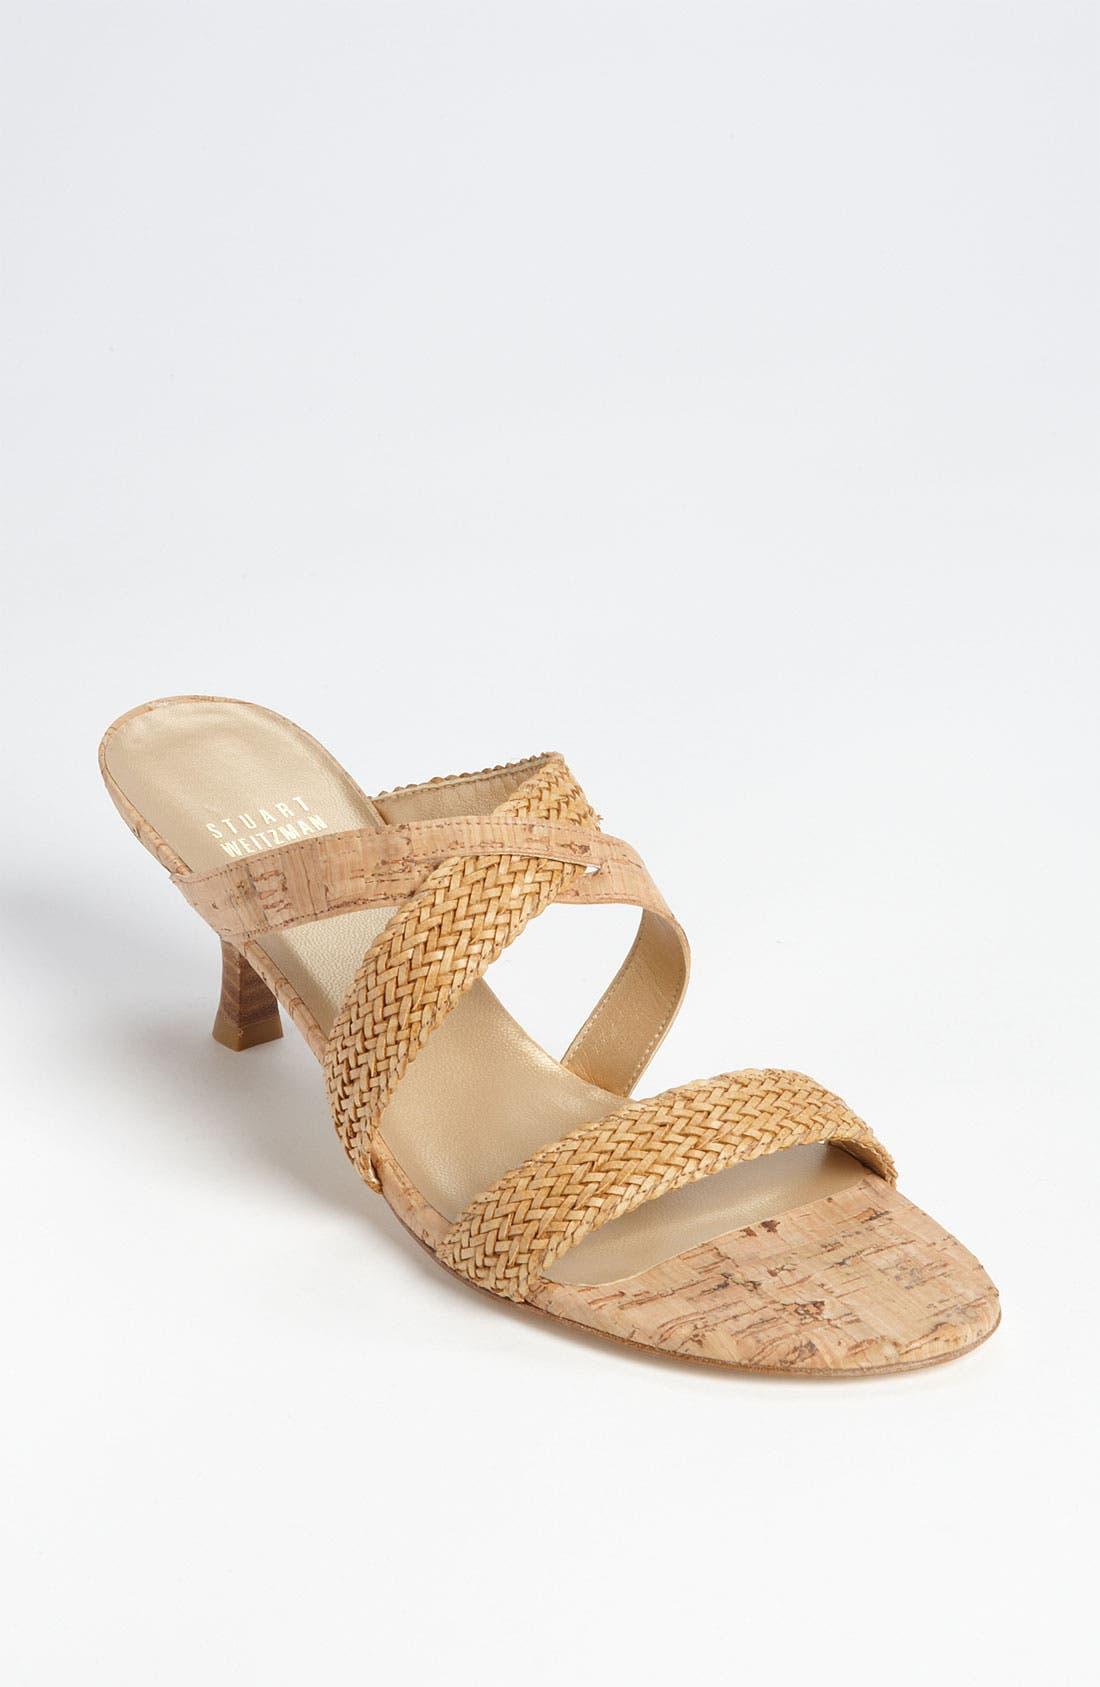 Alternate Image 1 Selected - Stuart Weitzman 'Purebred' Sandal